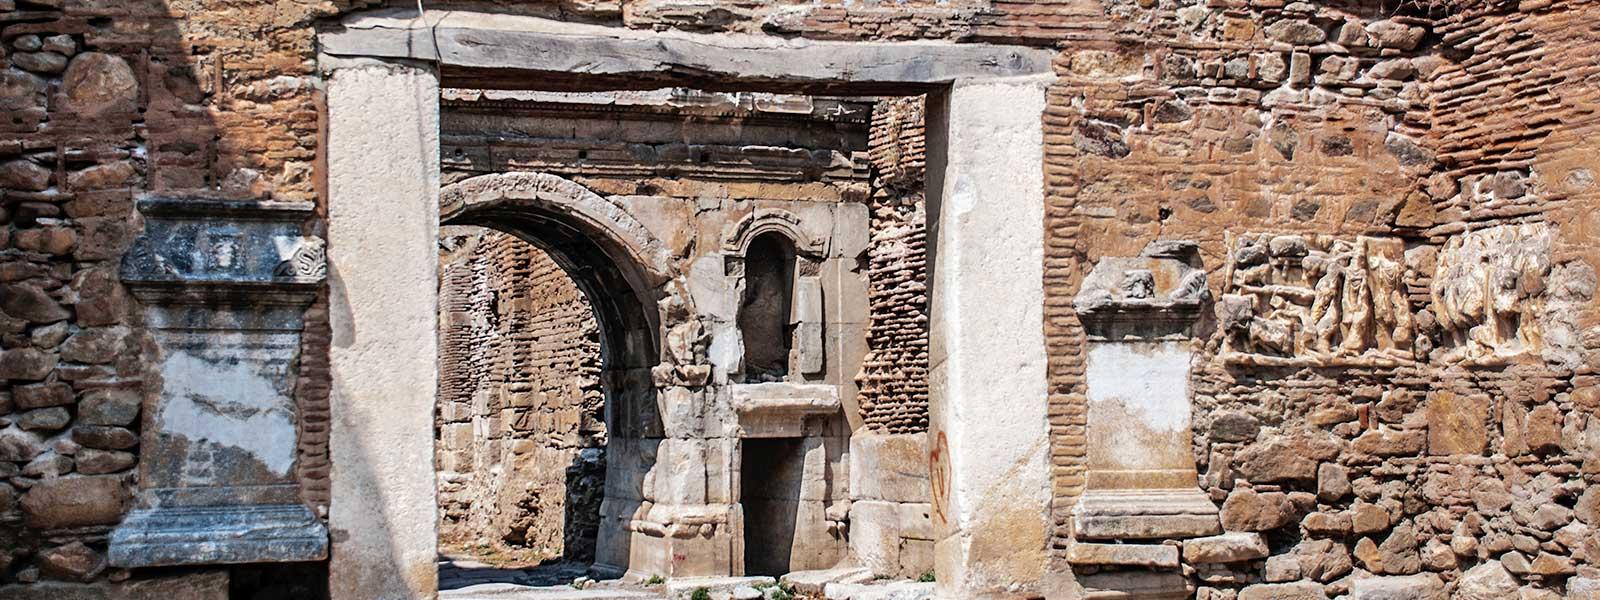 Iznik (Nicaea) Turkey